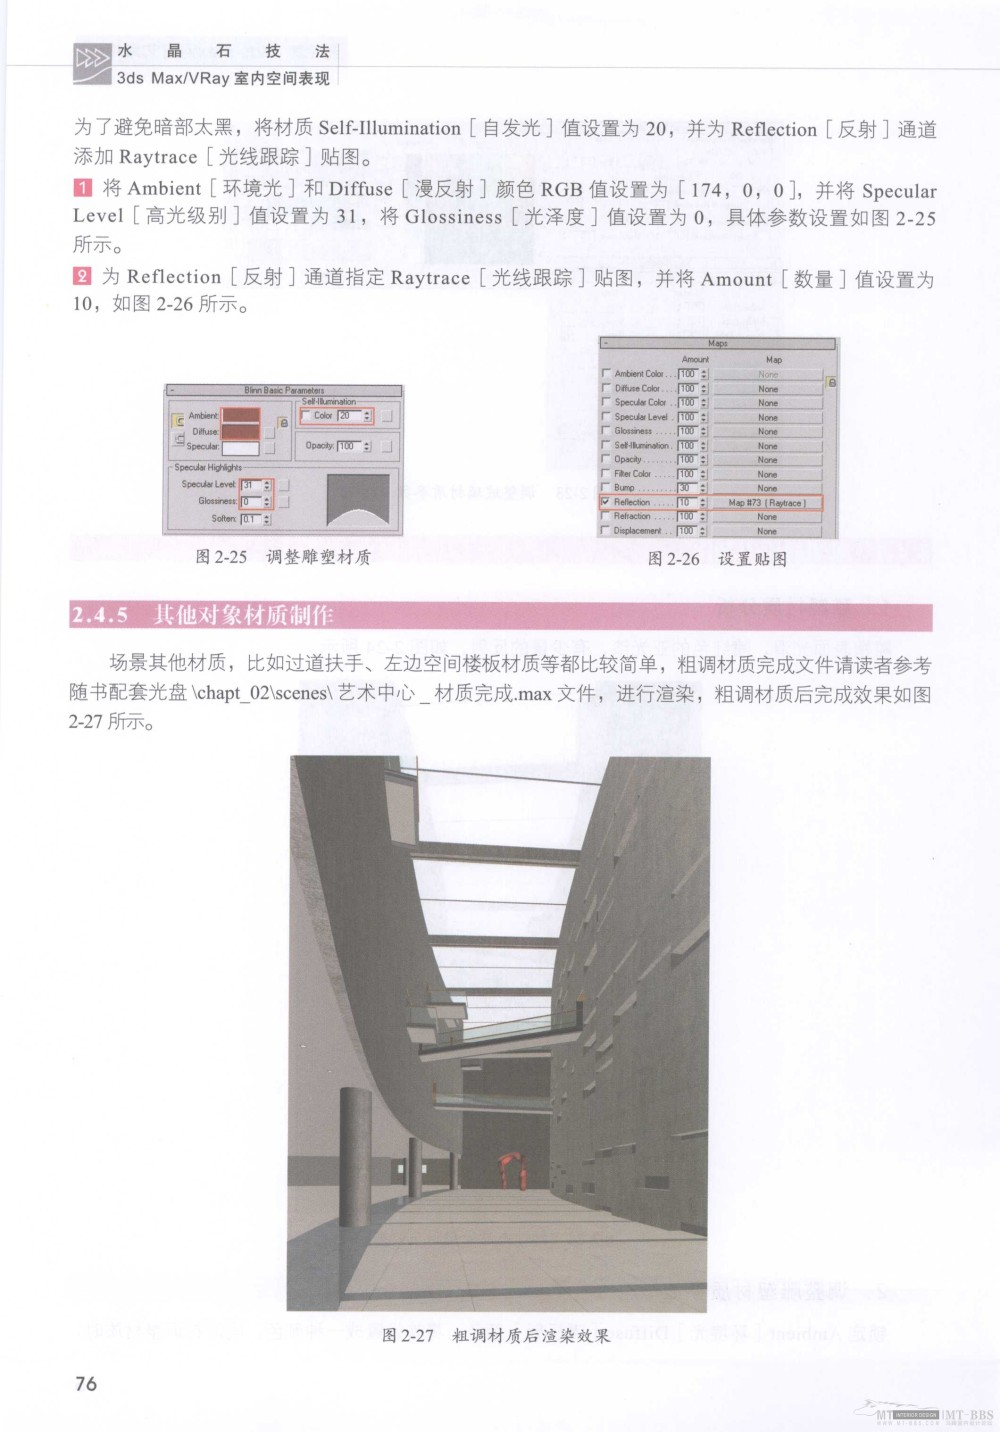 水晶石技法-3ds_Max&VRay室内空间表现_水晶石技法-3ds_Max&VRay室内空间表现_页面_082.jpg